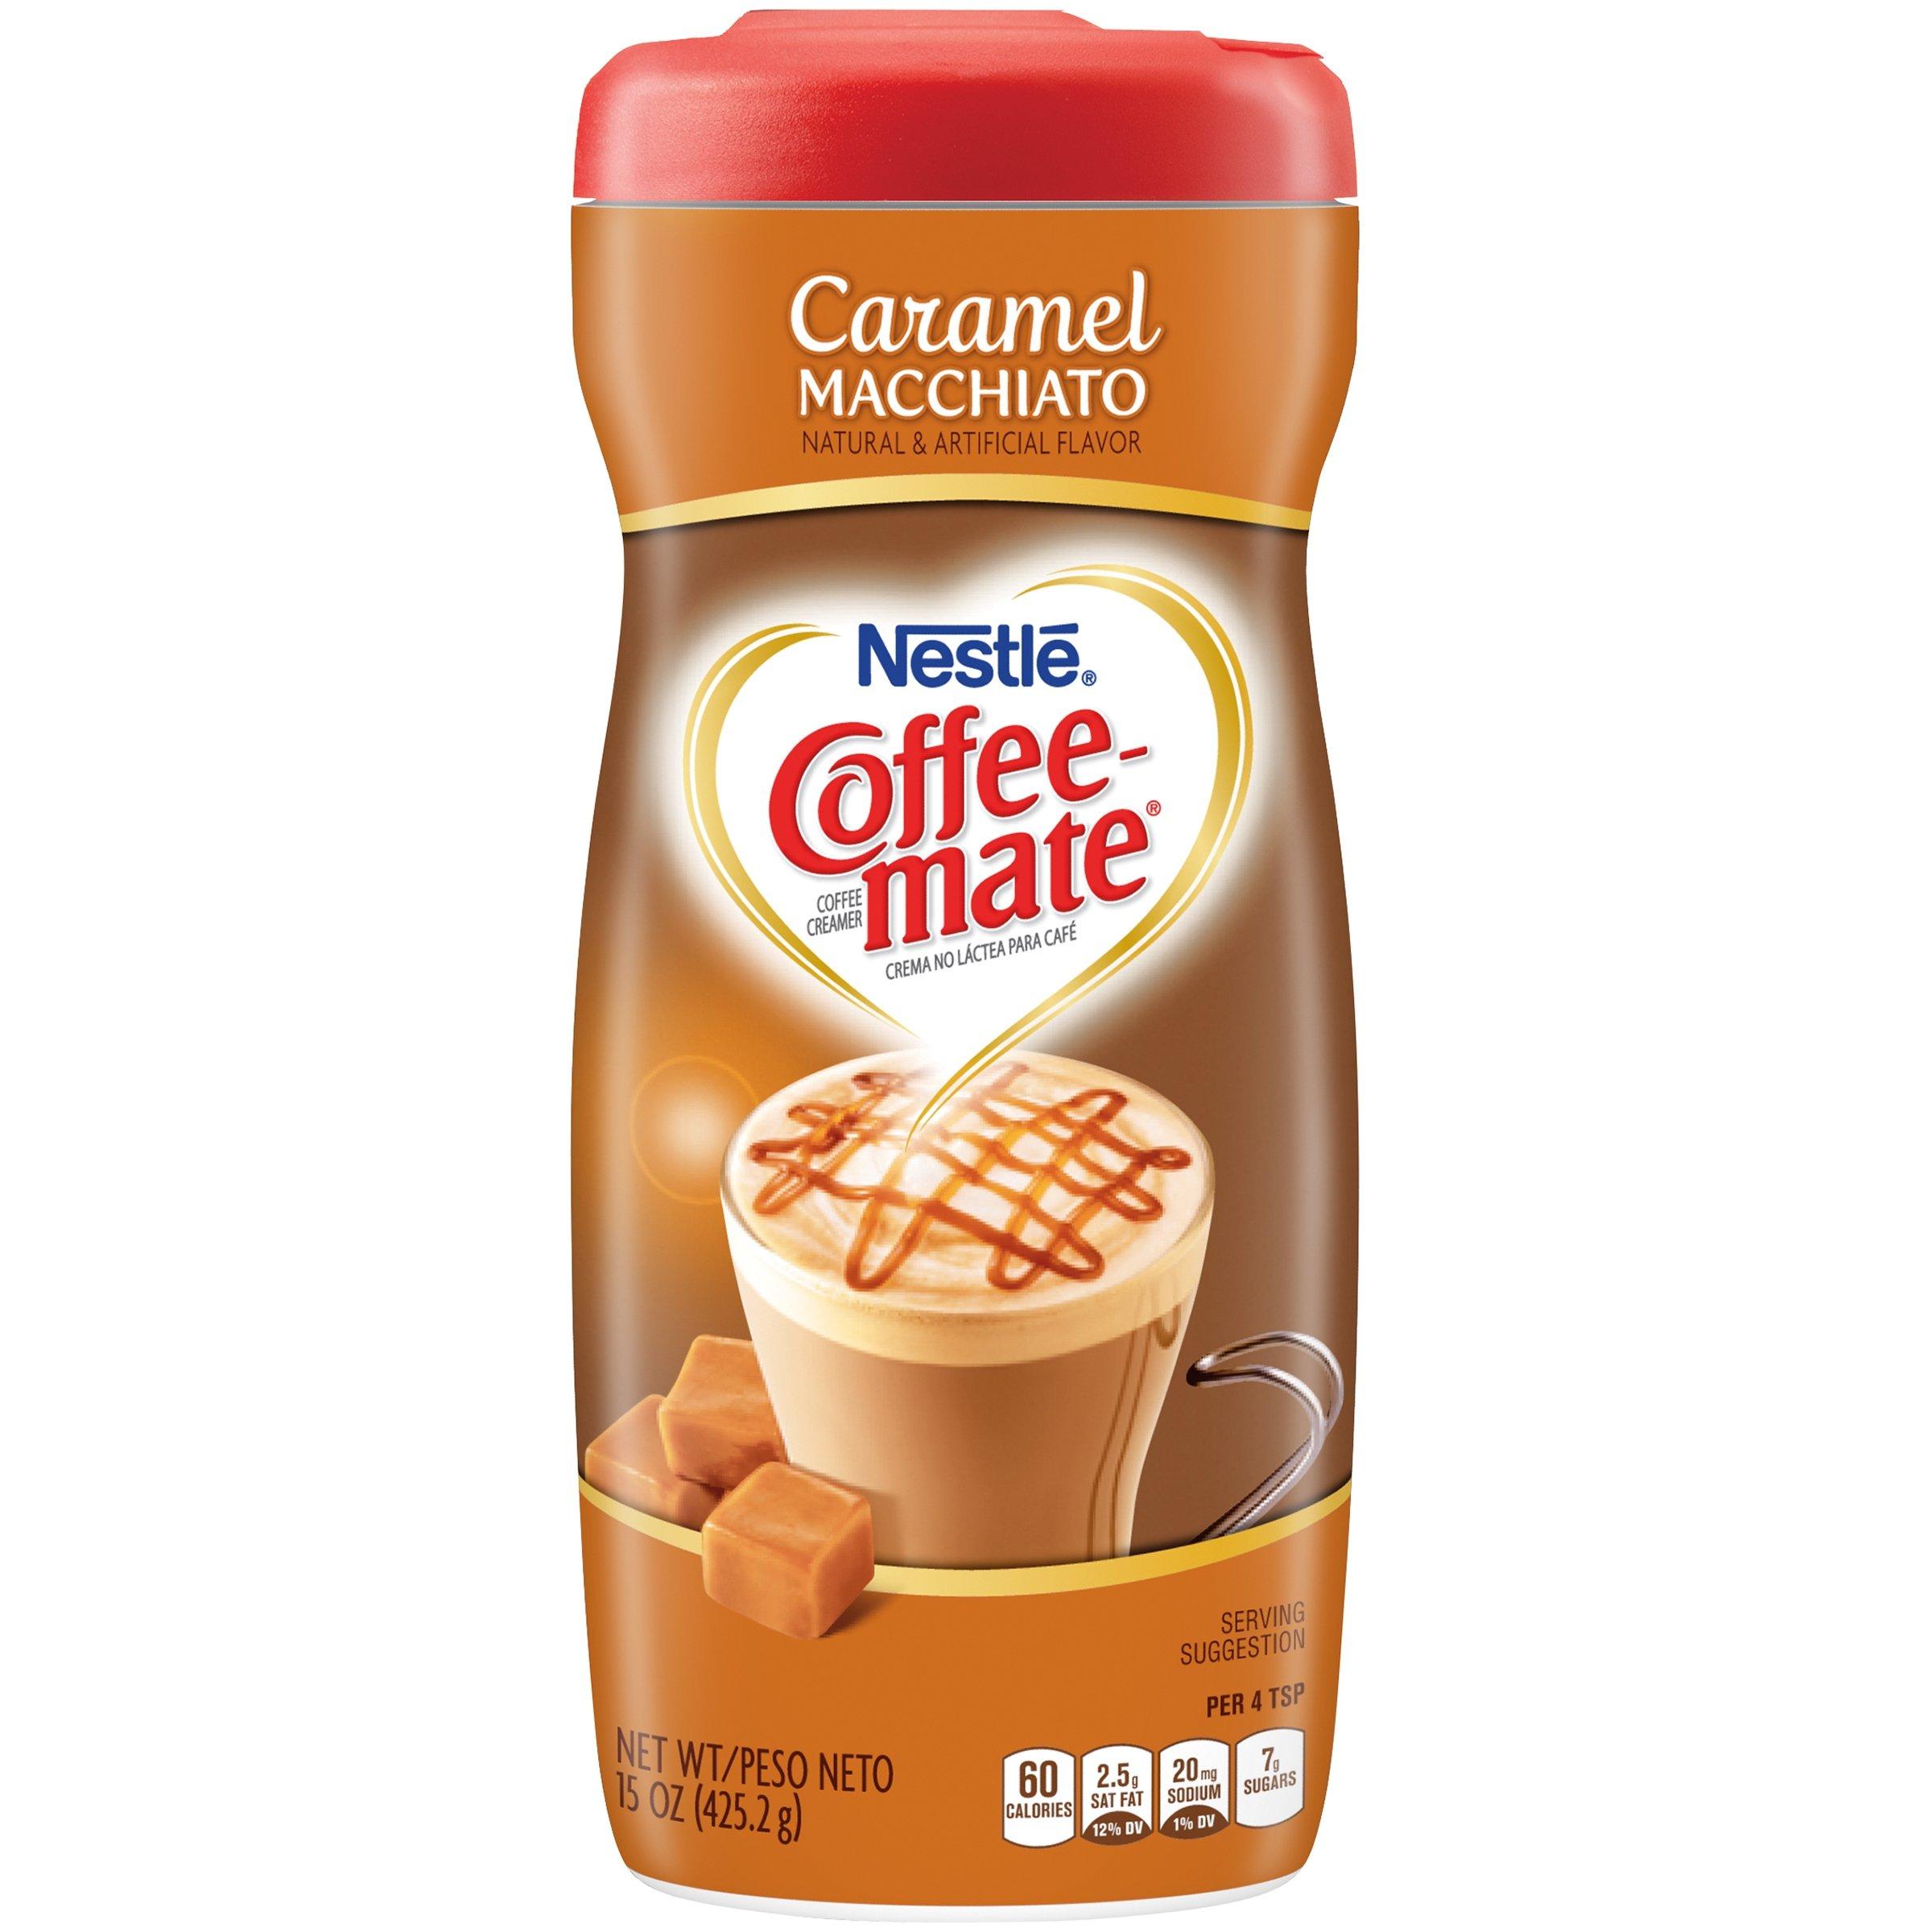 PACK OF 12 - Nestle Coffeemate Caramel Macchiato Coffee Creamer 15 oz. Canister